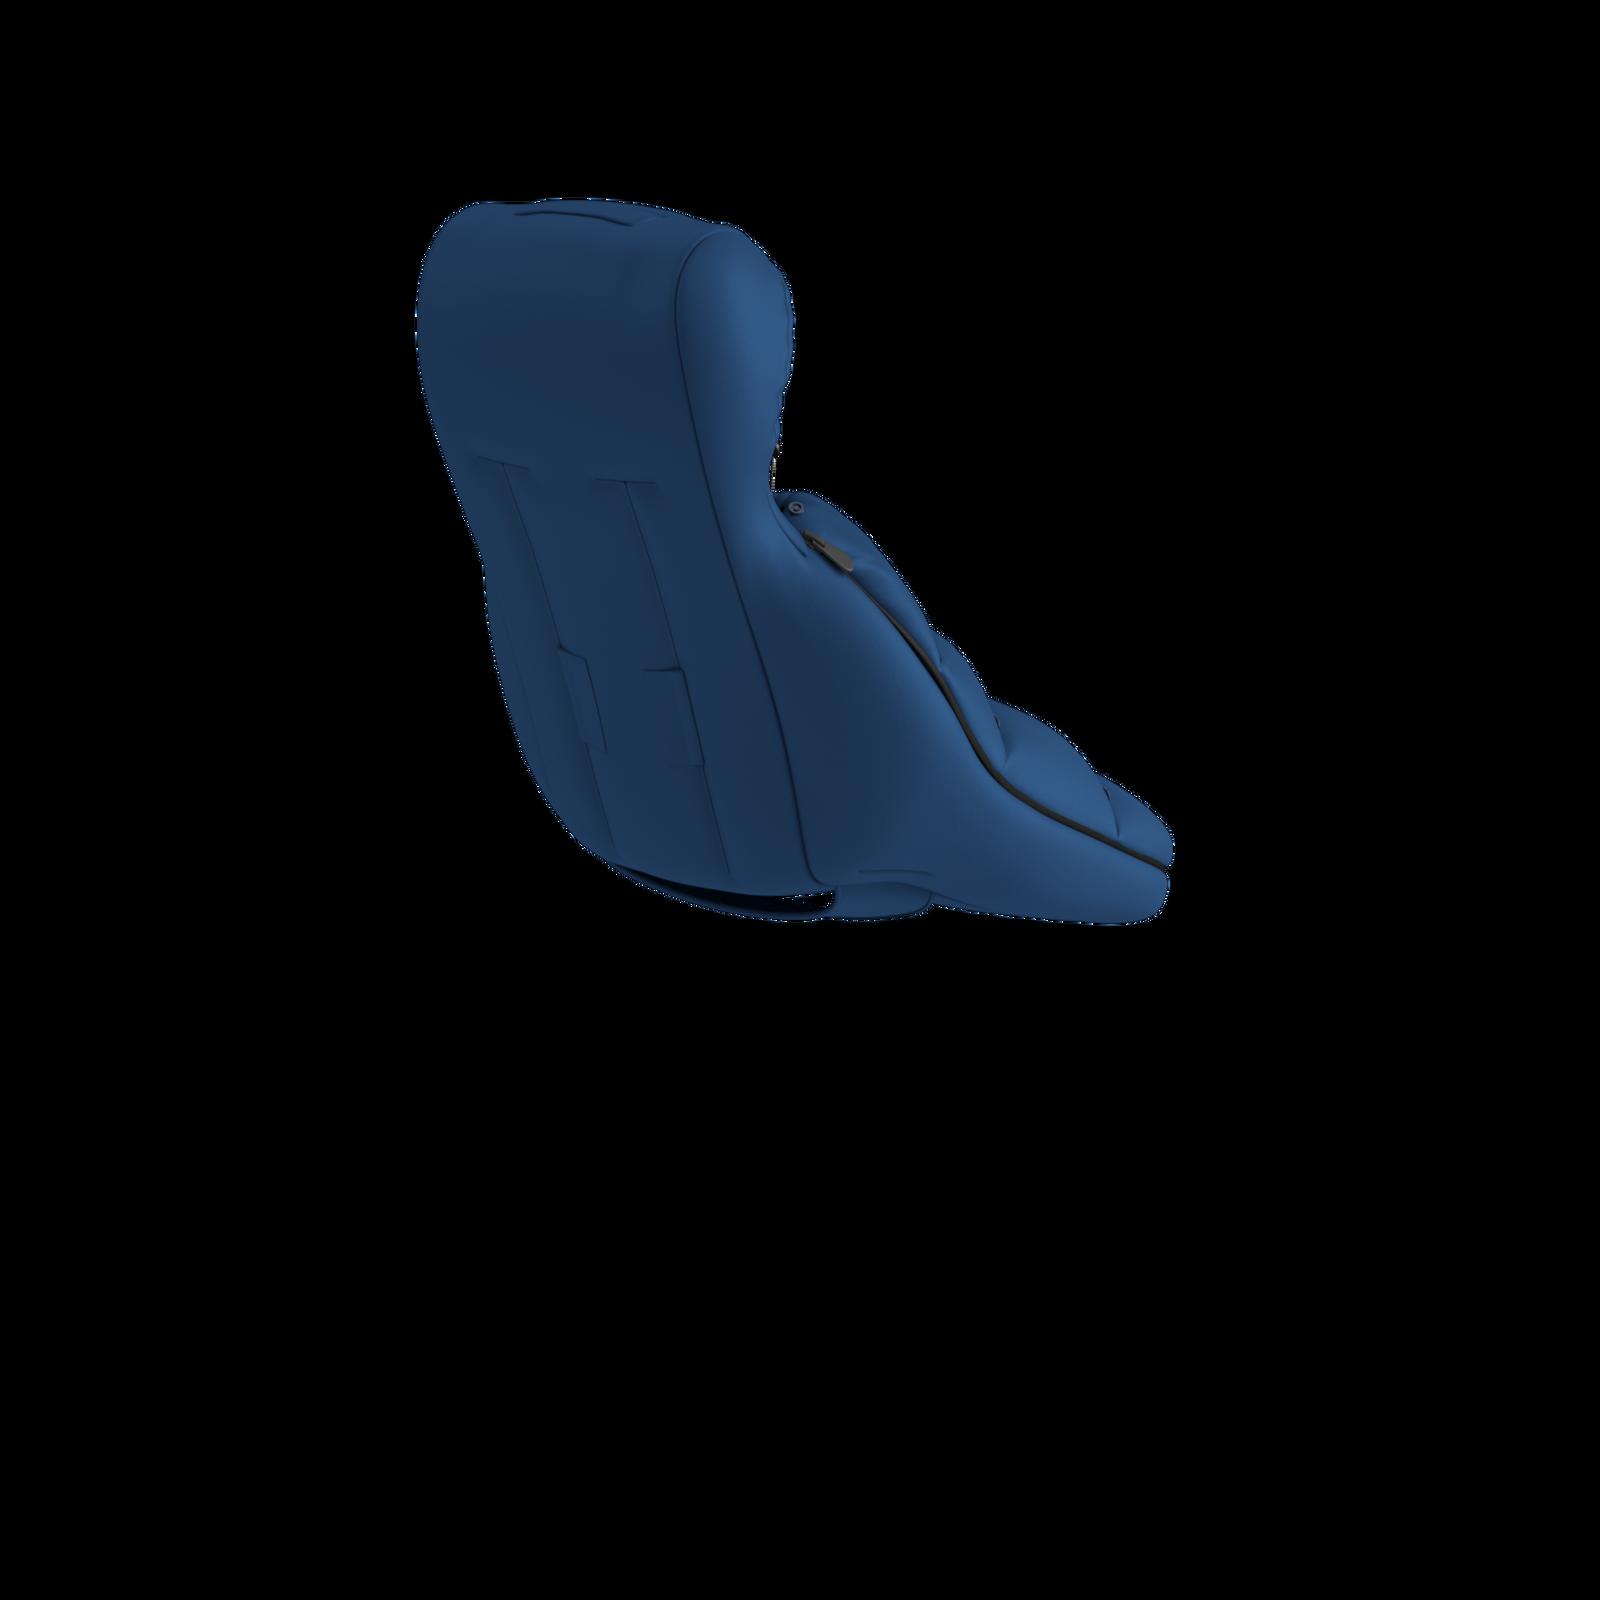 Bugaboo high-performance footmuff